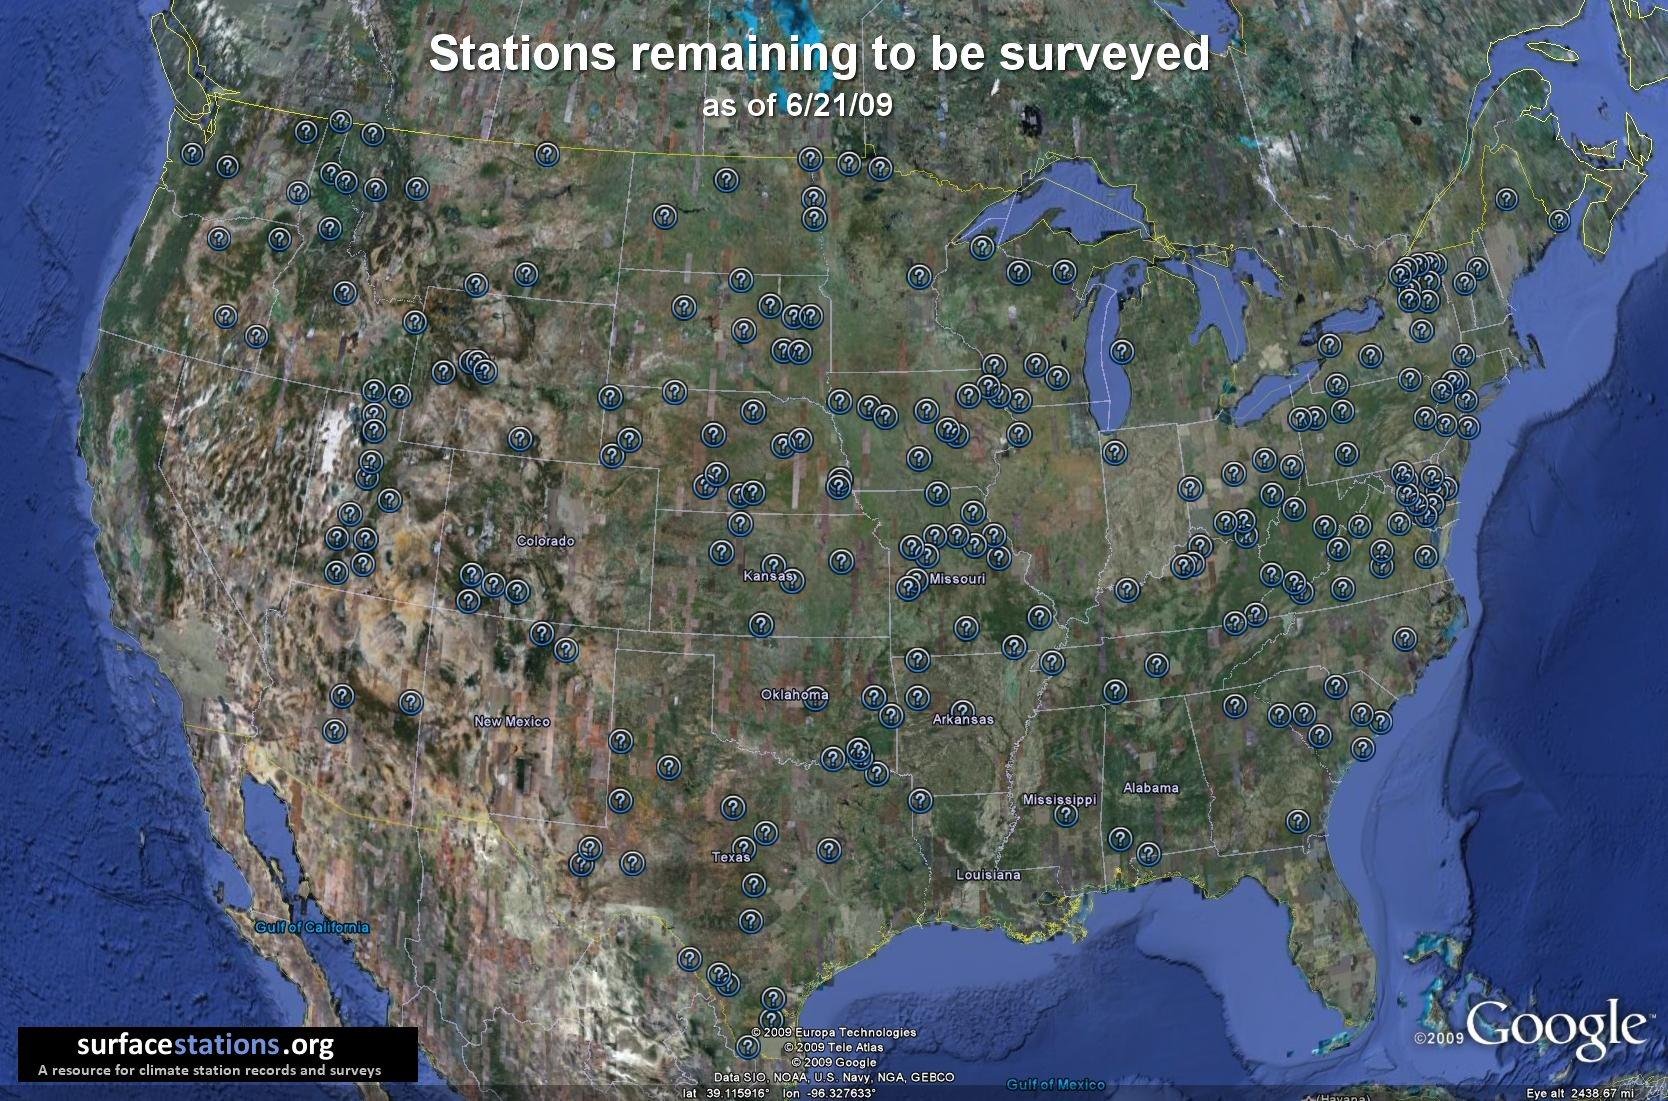 USHCN Surface Stations remaining to be surveyed - click for larger image